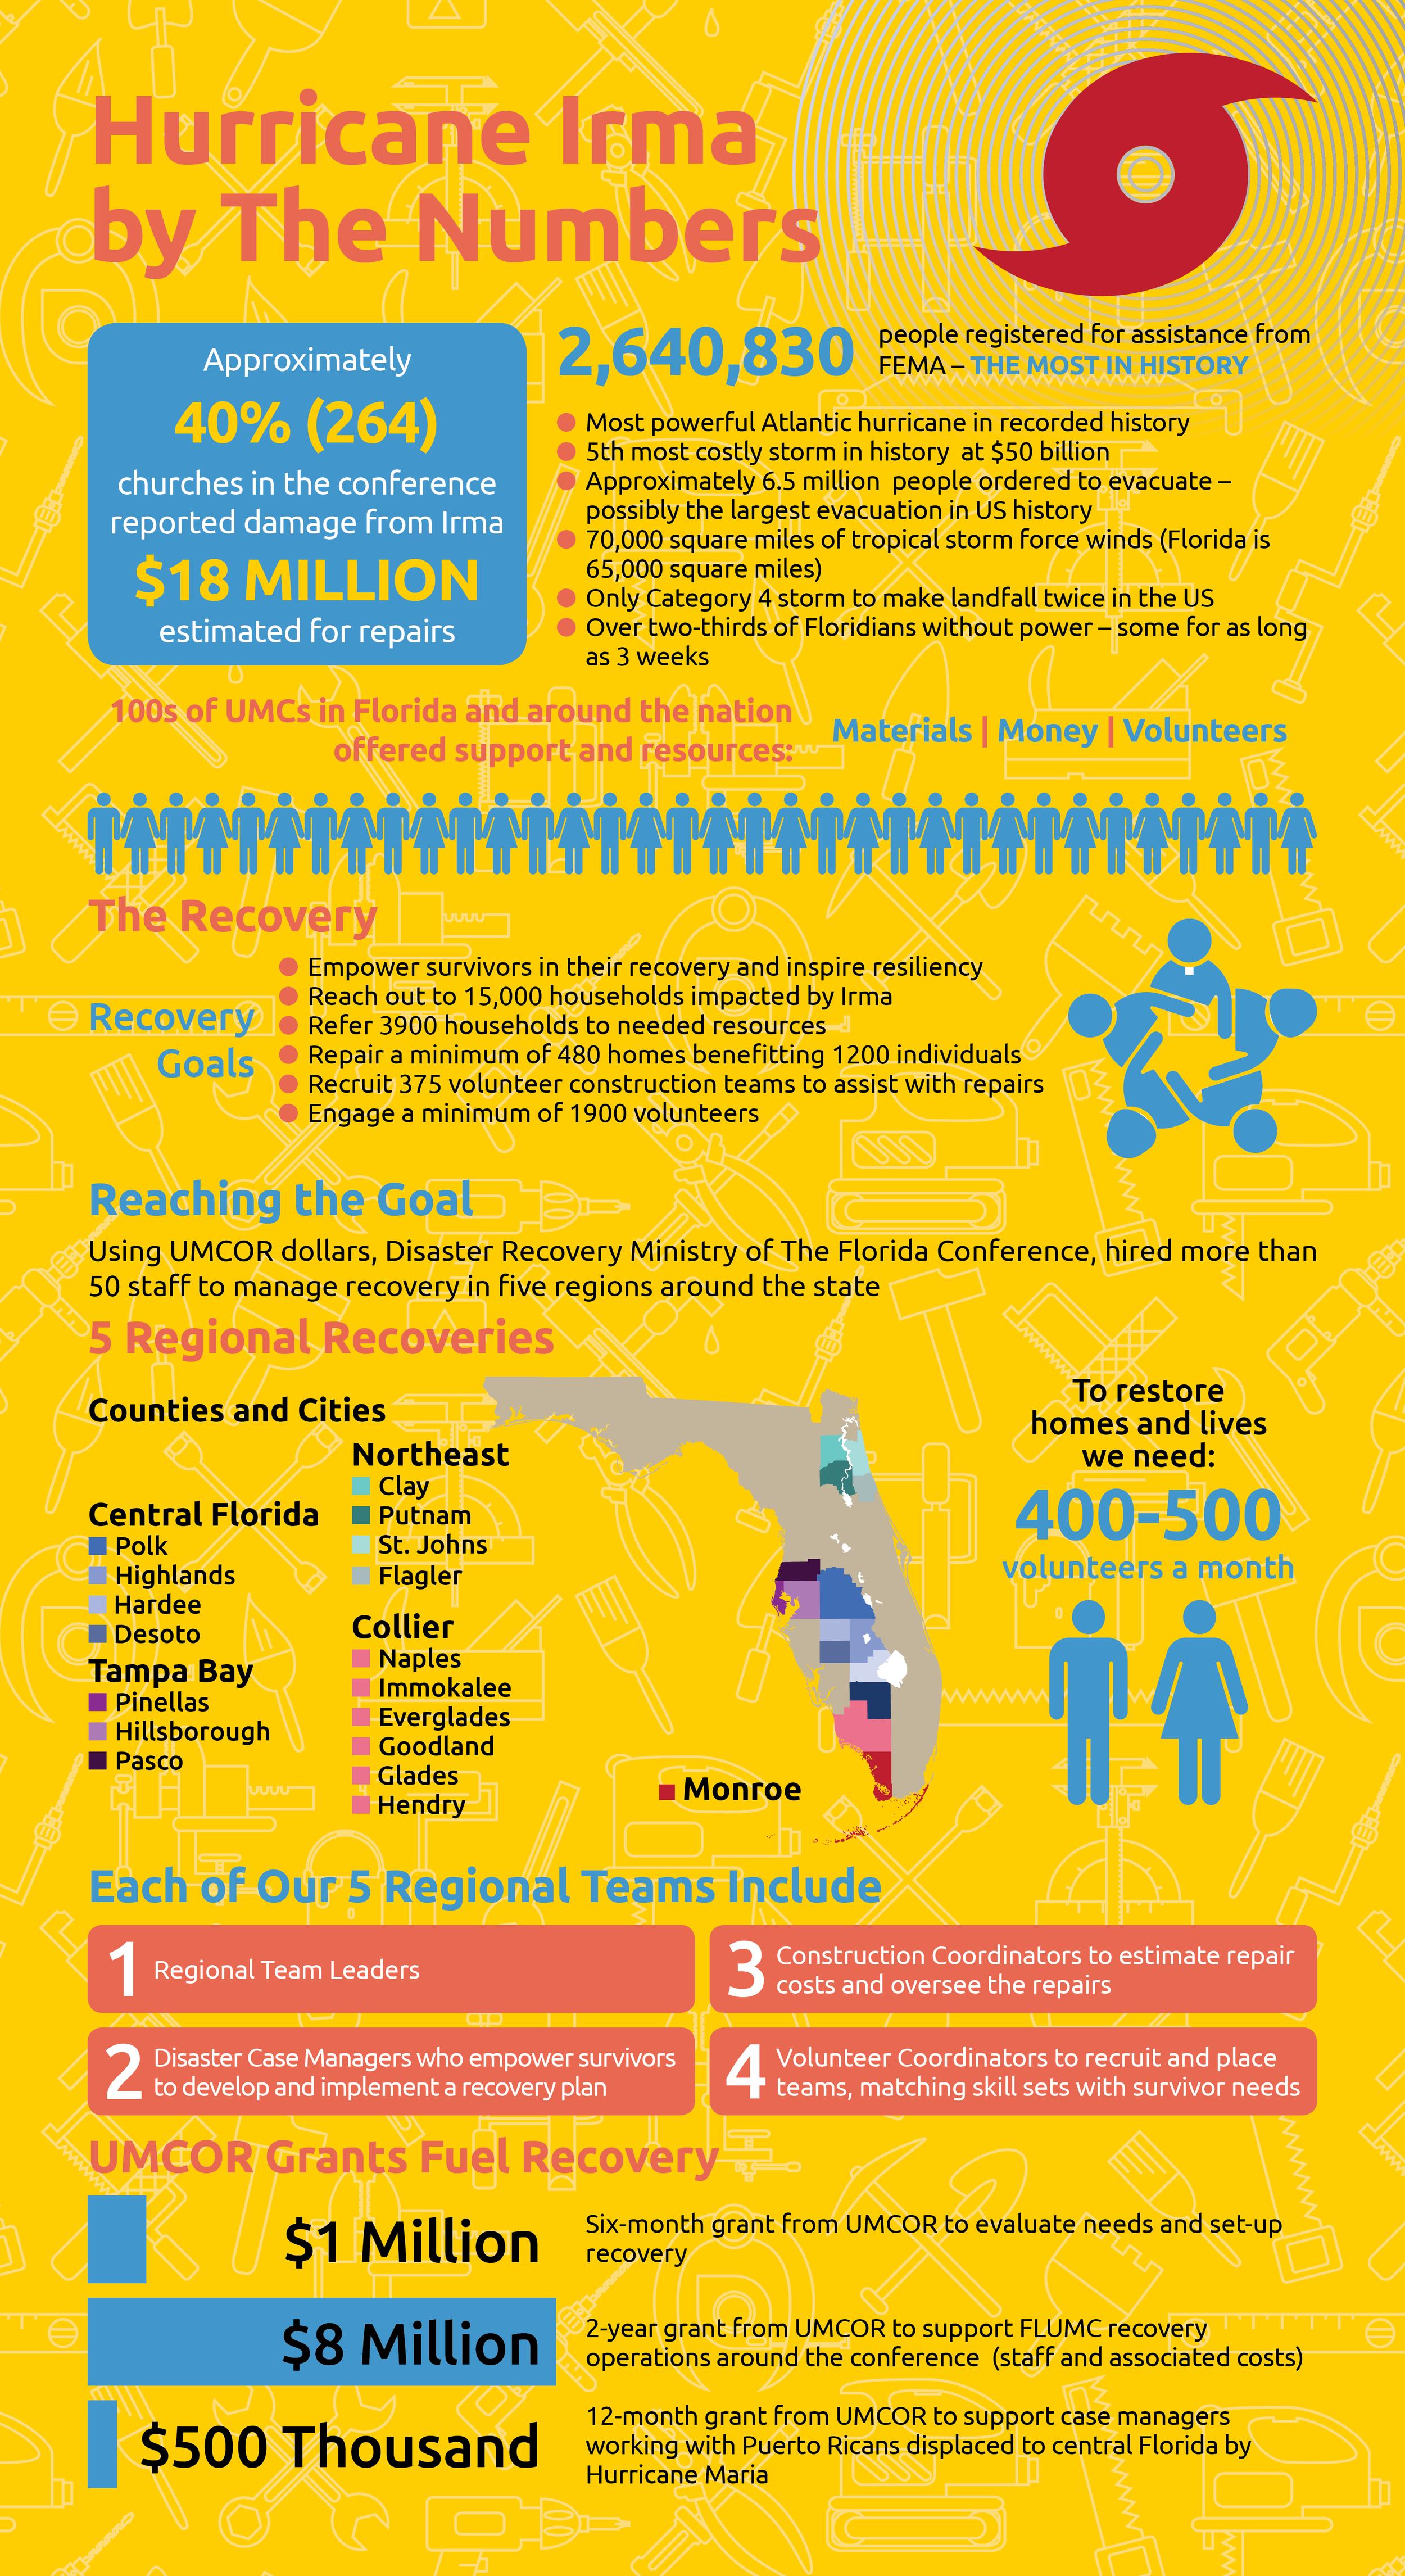 FloridaRestores-Infographic.png